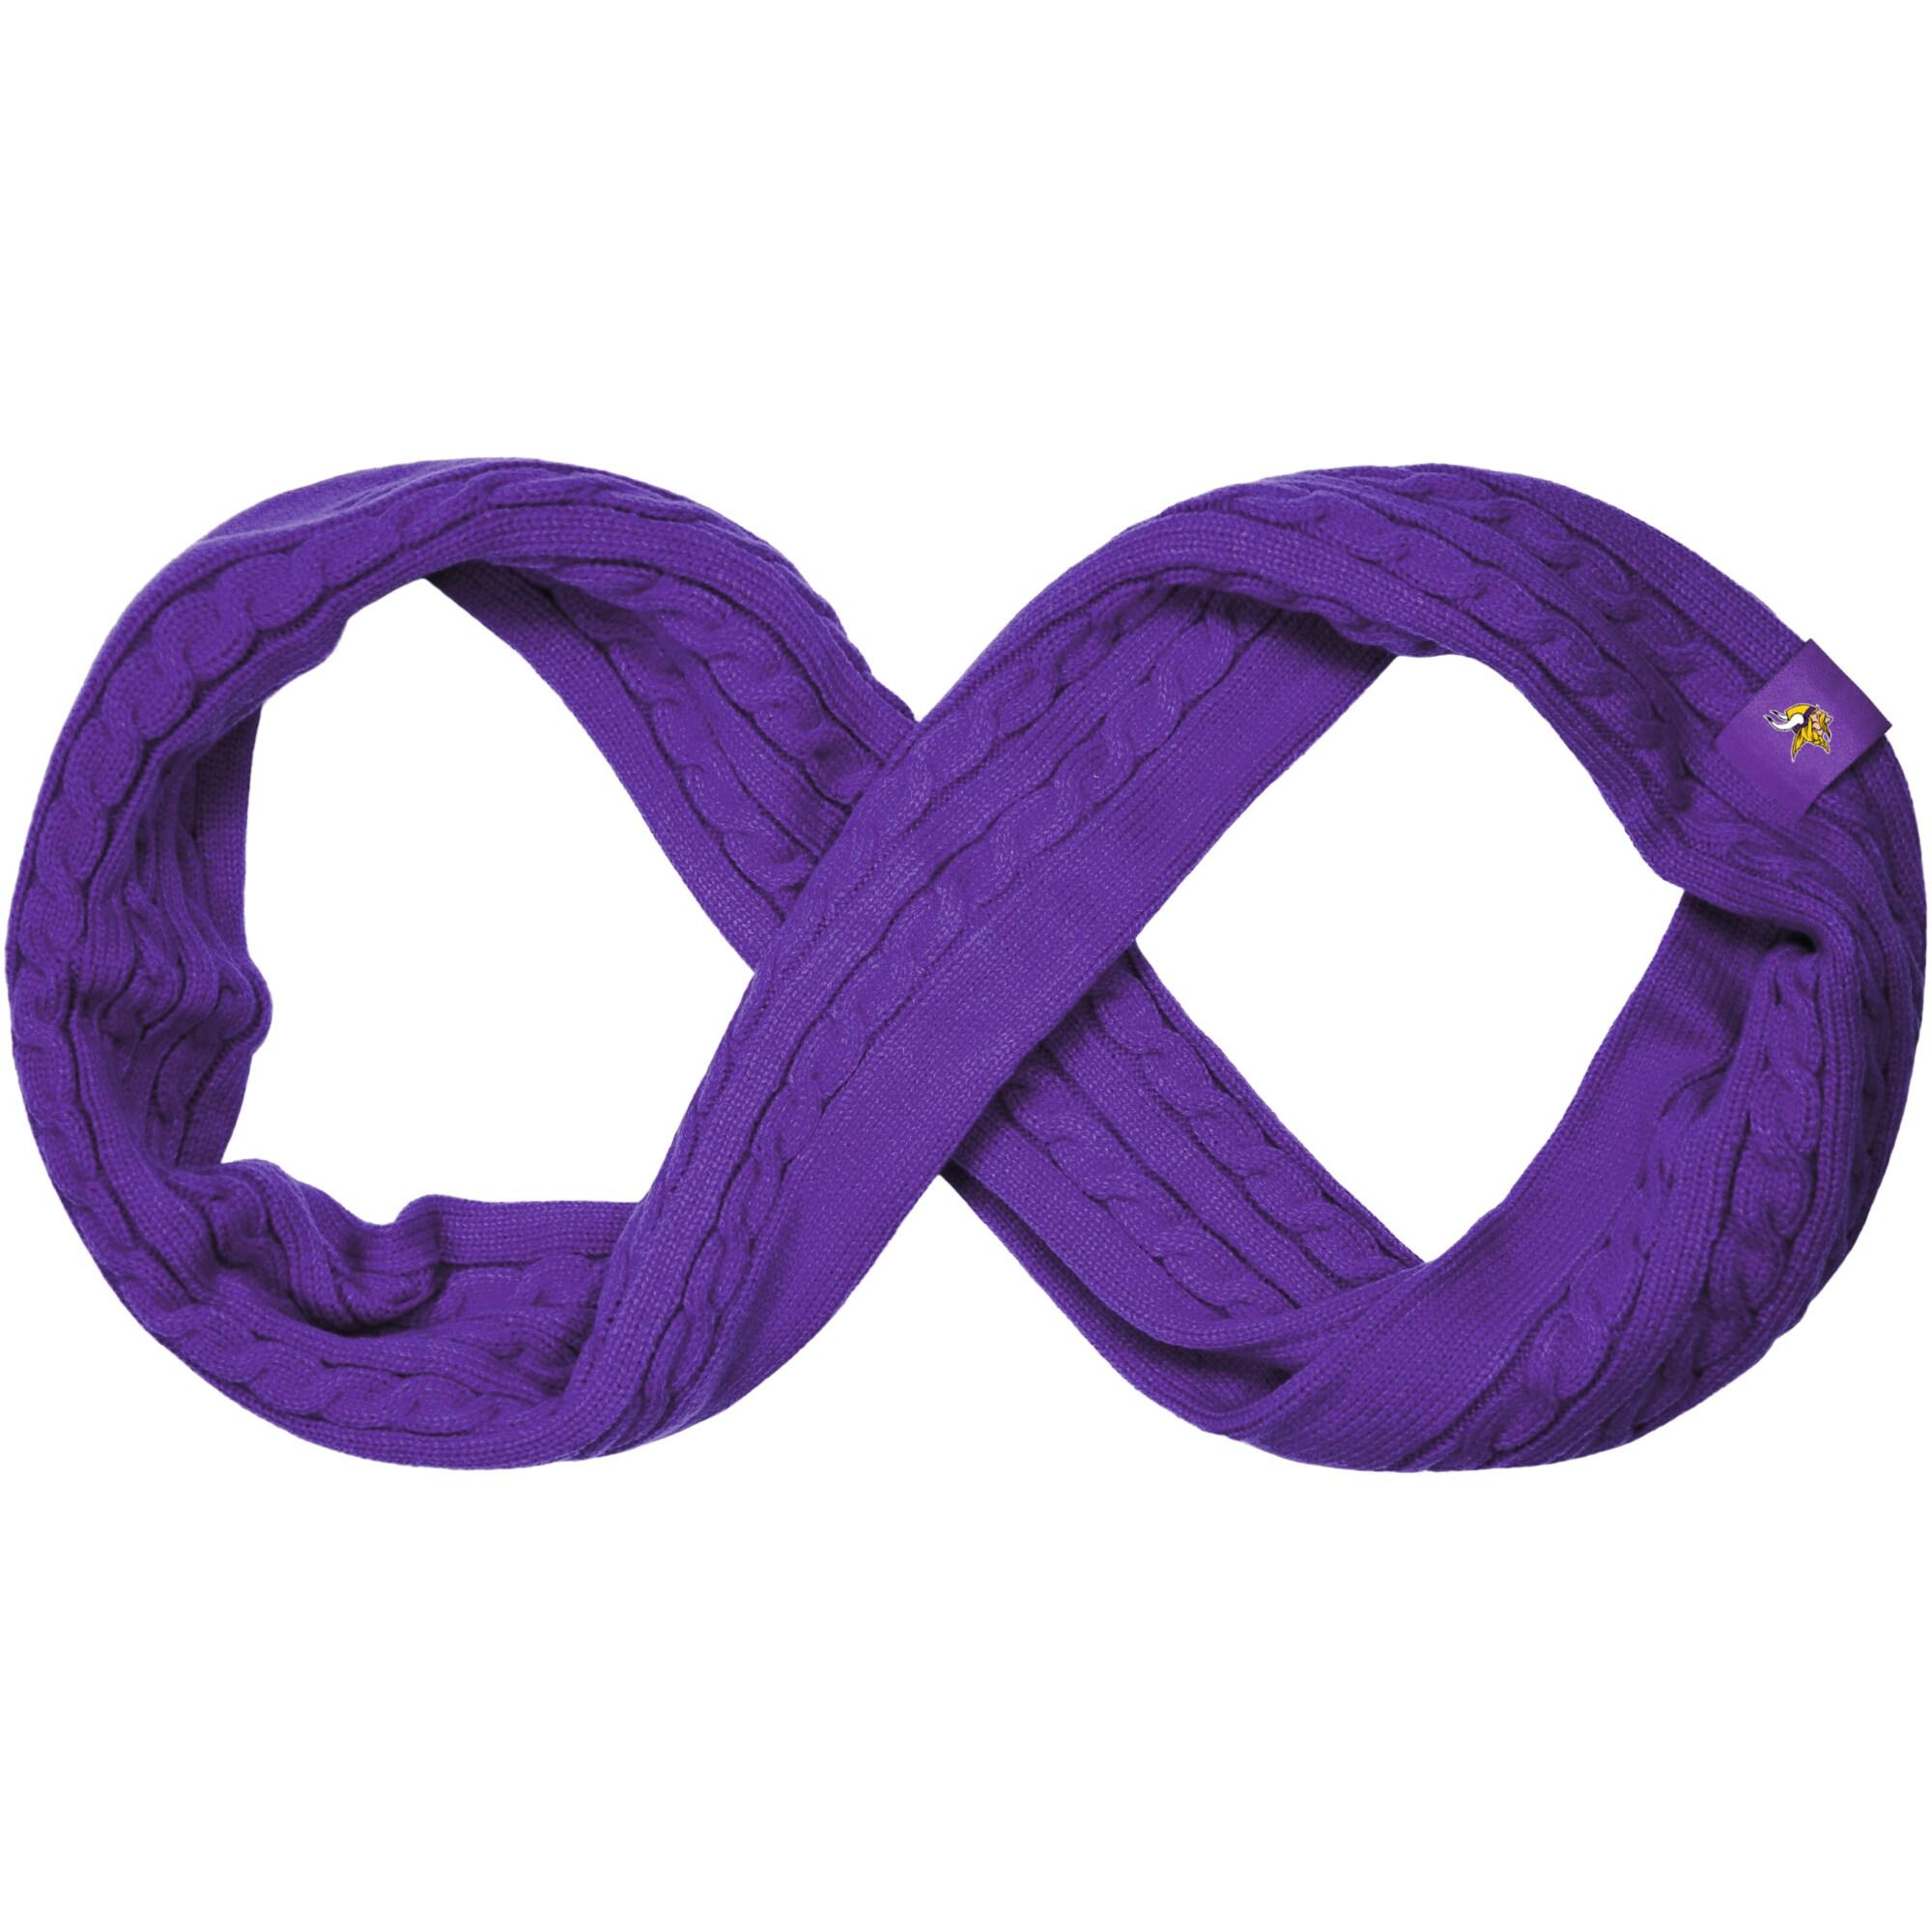 Minnesota Vikings Women's Cable Knit Infinity Scarf - Purple